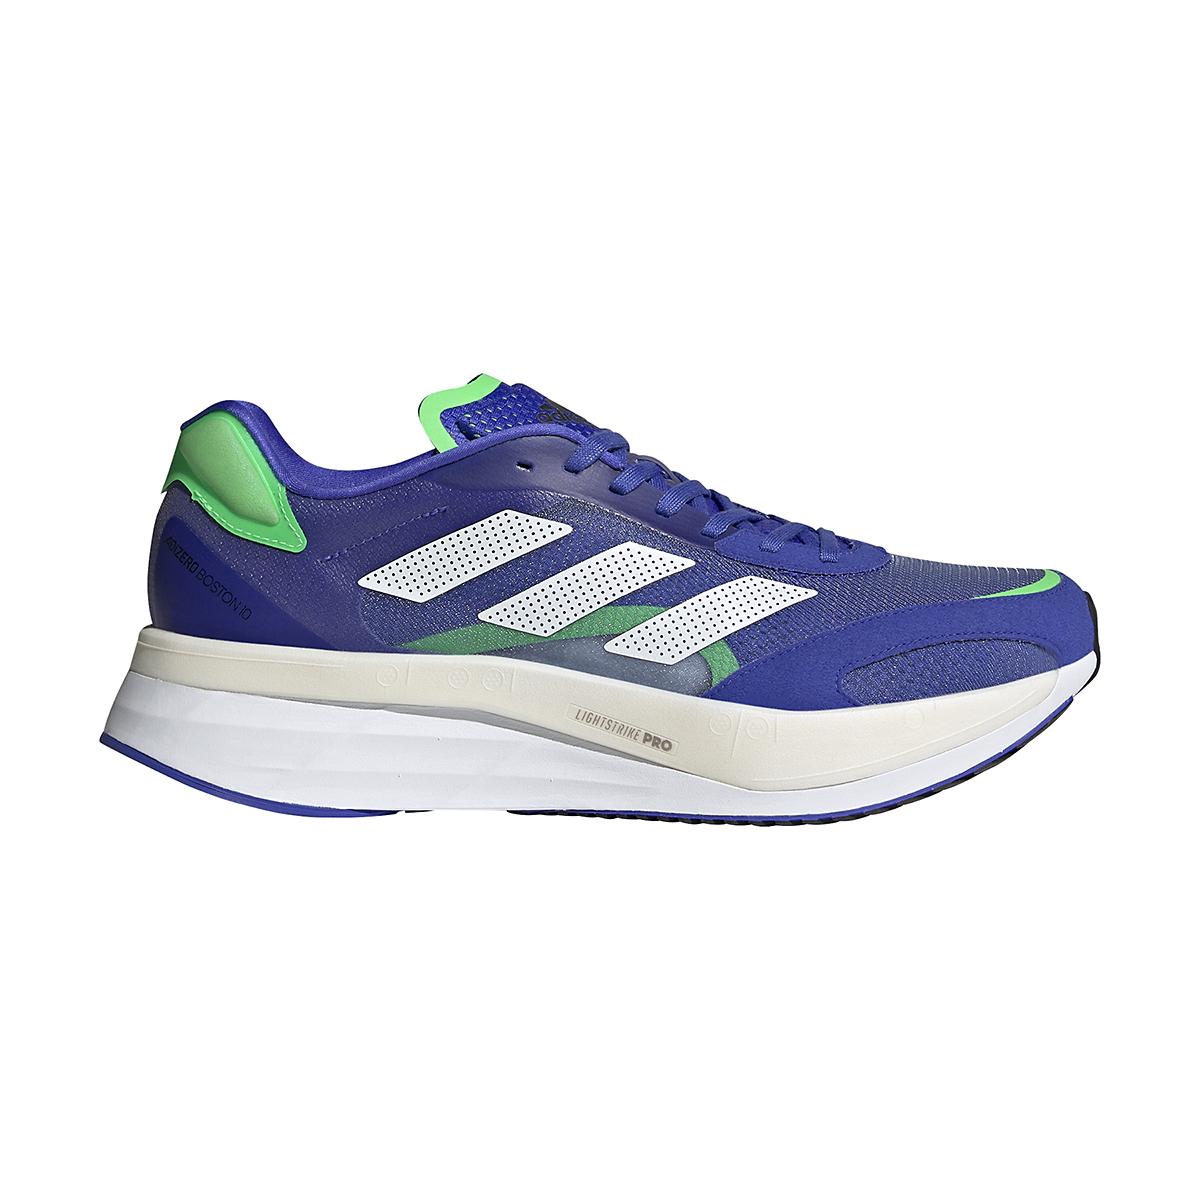 Men's Adidas Adizero Boston 10 Running Shoe - Color: Sonic Ink/White/Screaming Green - Size: 6.5 - Width: Regular, Sonic Ink/White/Screaming Green, large, image 1